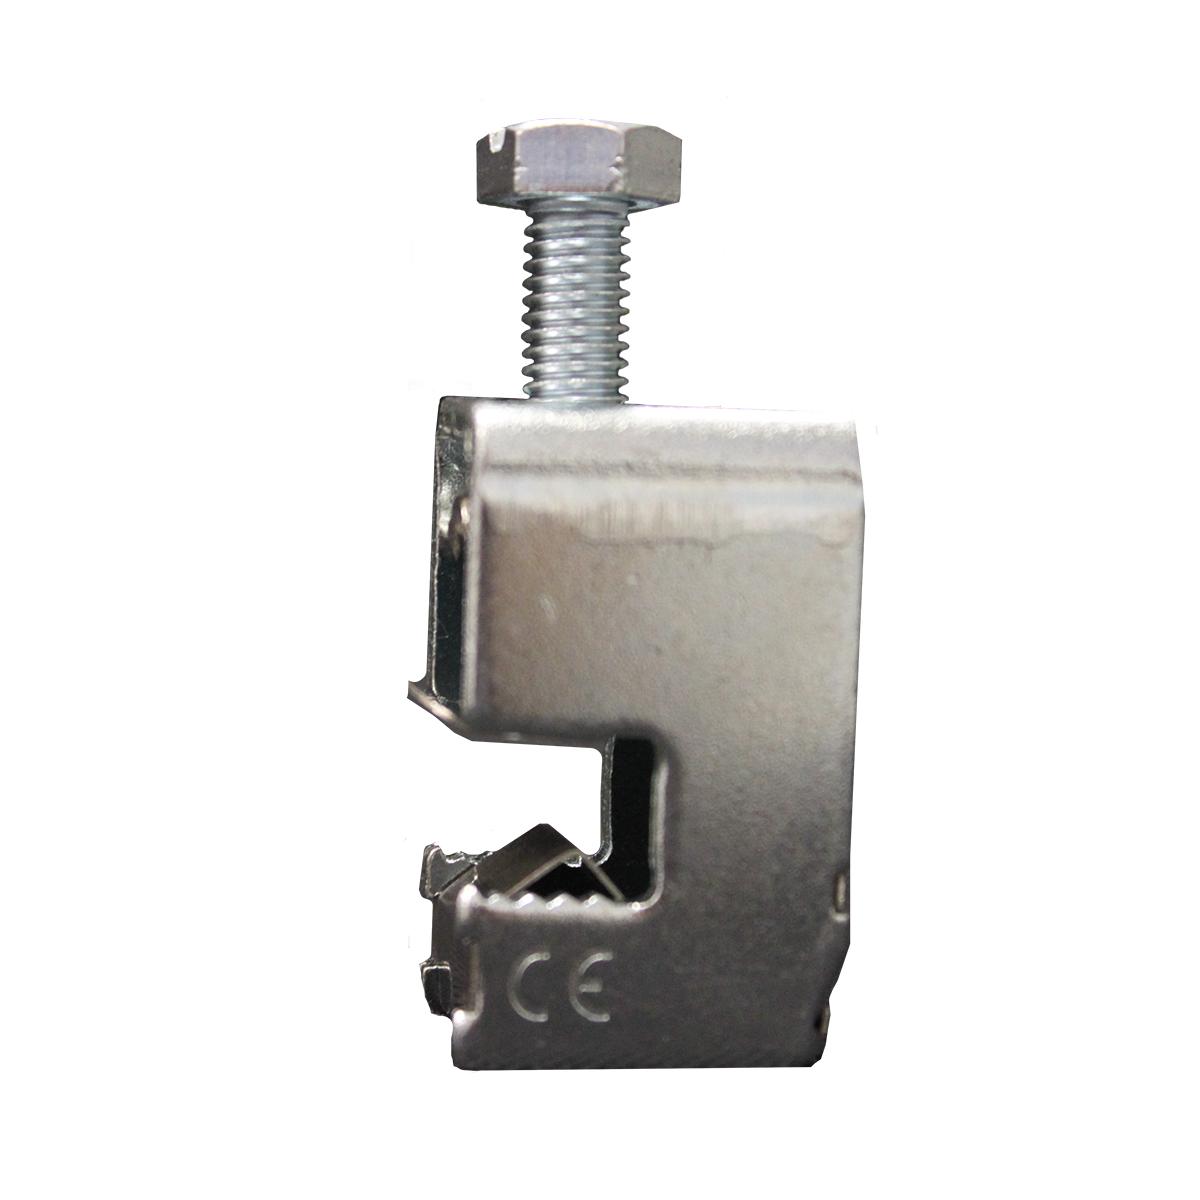 1 Stk Alu-Kupfer-Leiteranschlußklemme 4 -35mm² / 5mm² IS5053505-